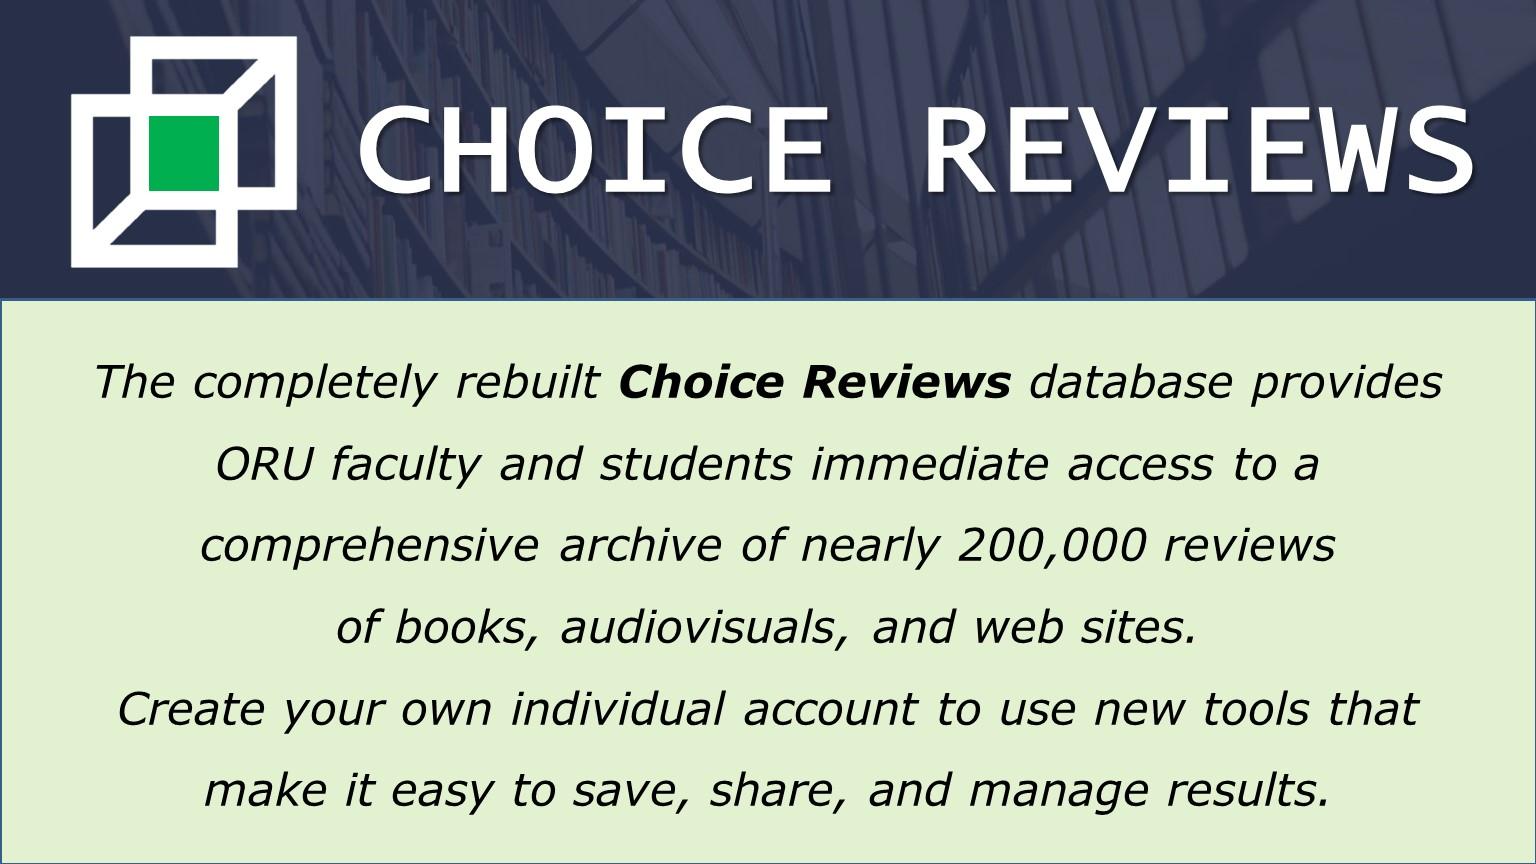 Choice Reviews